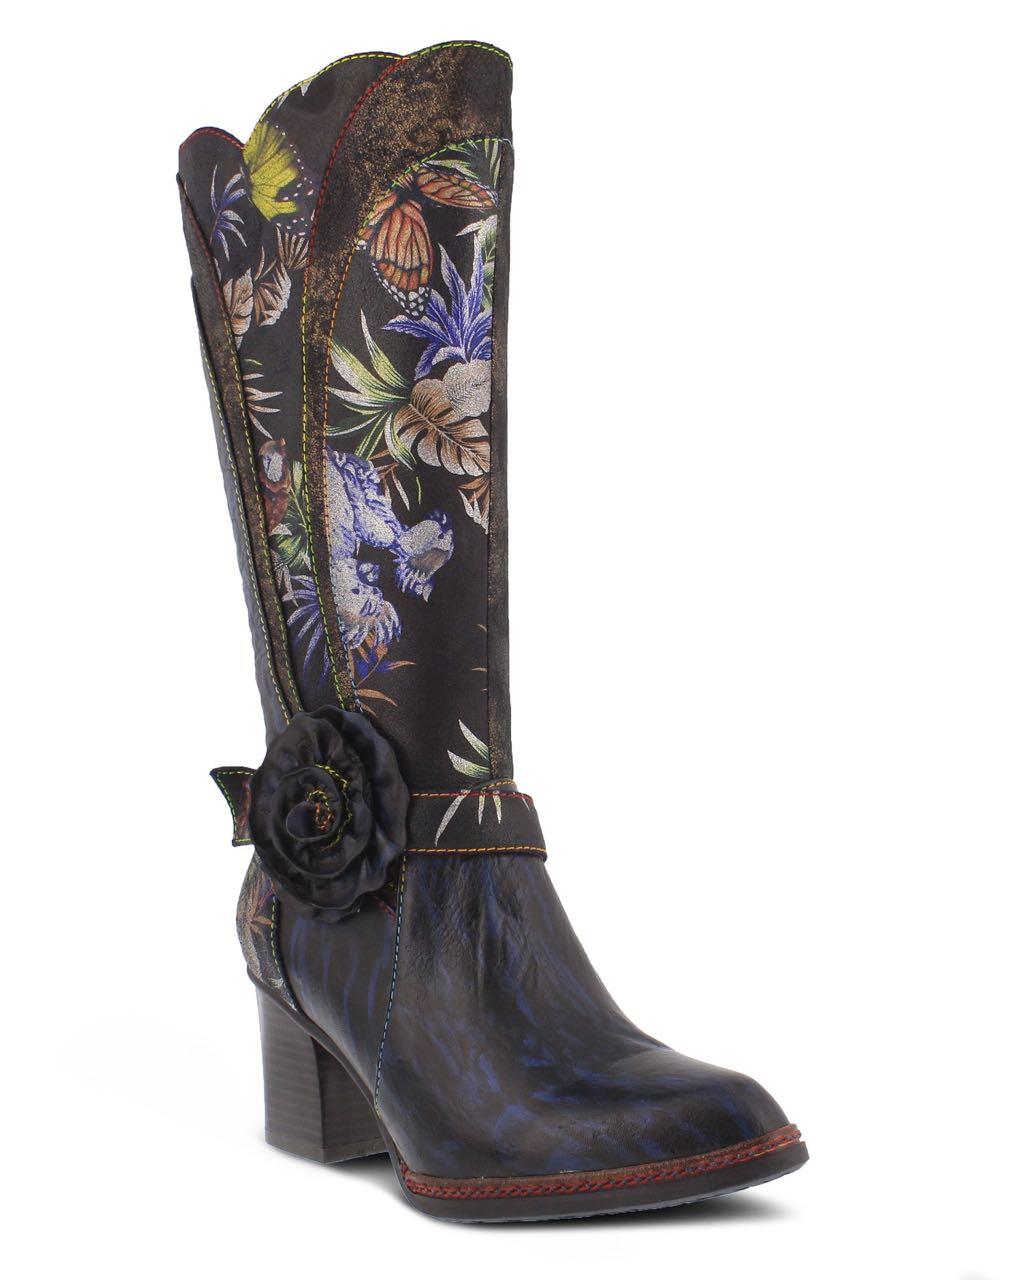 L'Artiste Boots Savannah